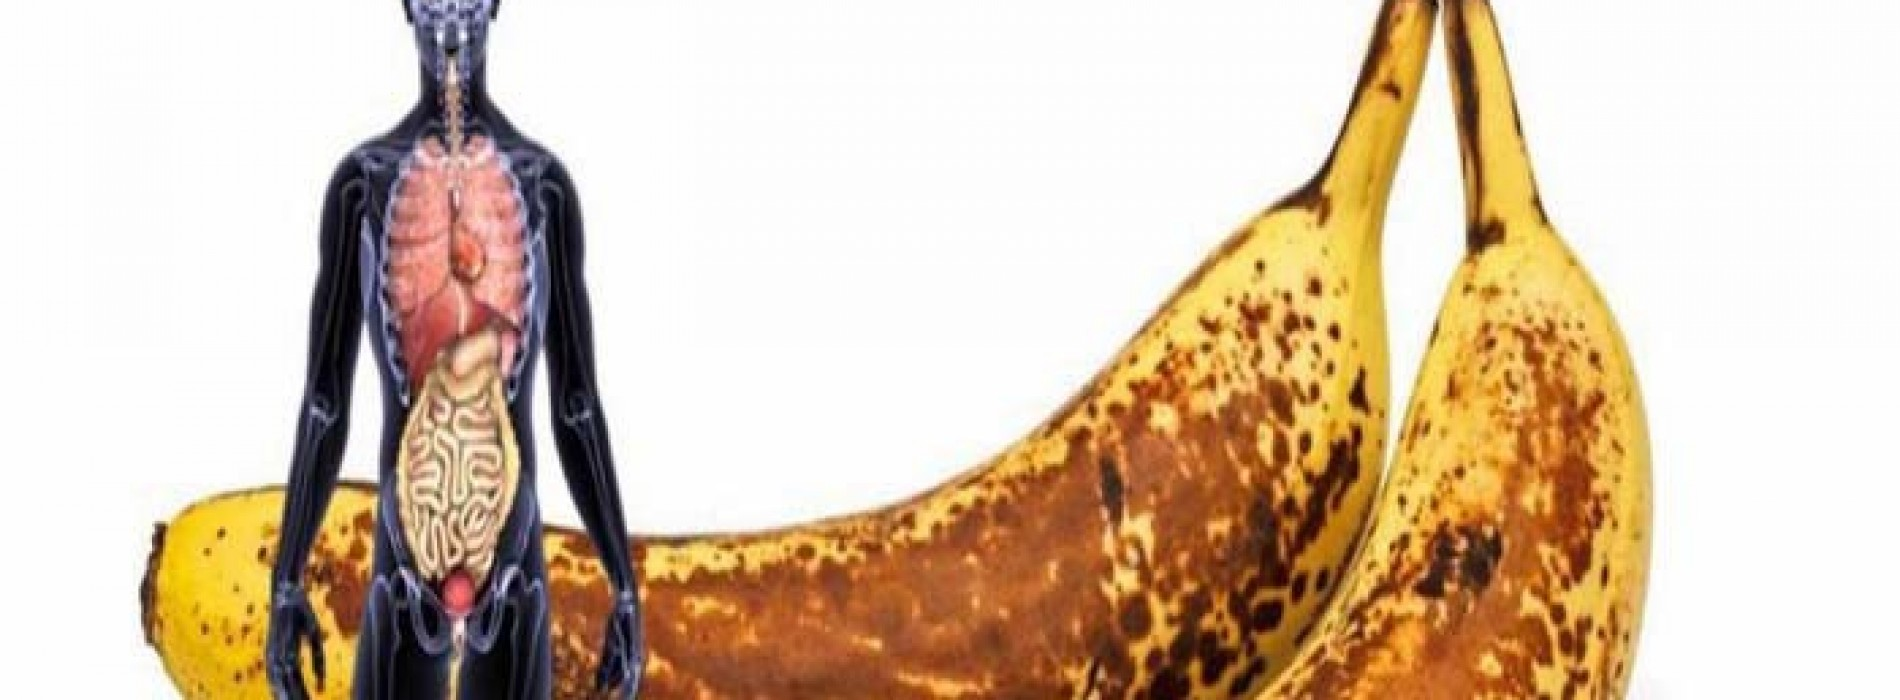 Gooi rijpe bananen niet weg, maak er een supergezond anti-oxidanten gerecht mee!